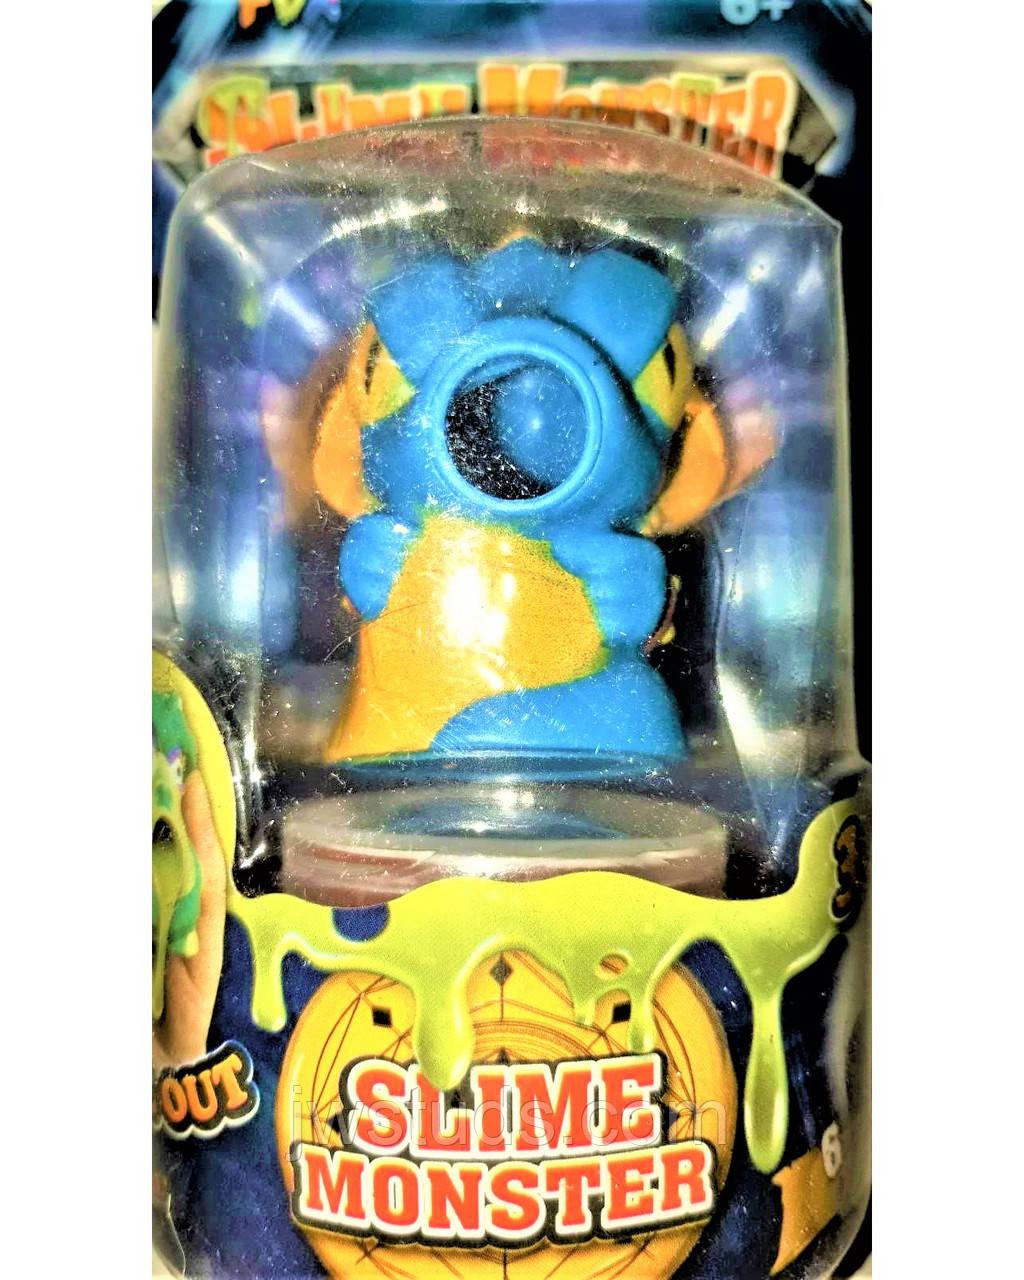 СЛАЙМ  Slime  с игрушкой плевалкой ДРАКОН голубой монстер Slime monster